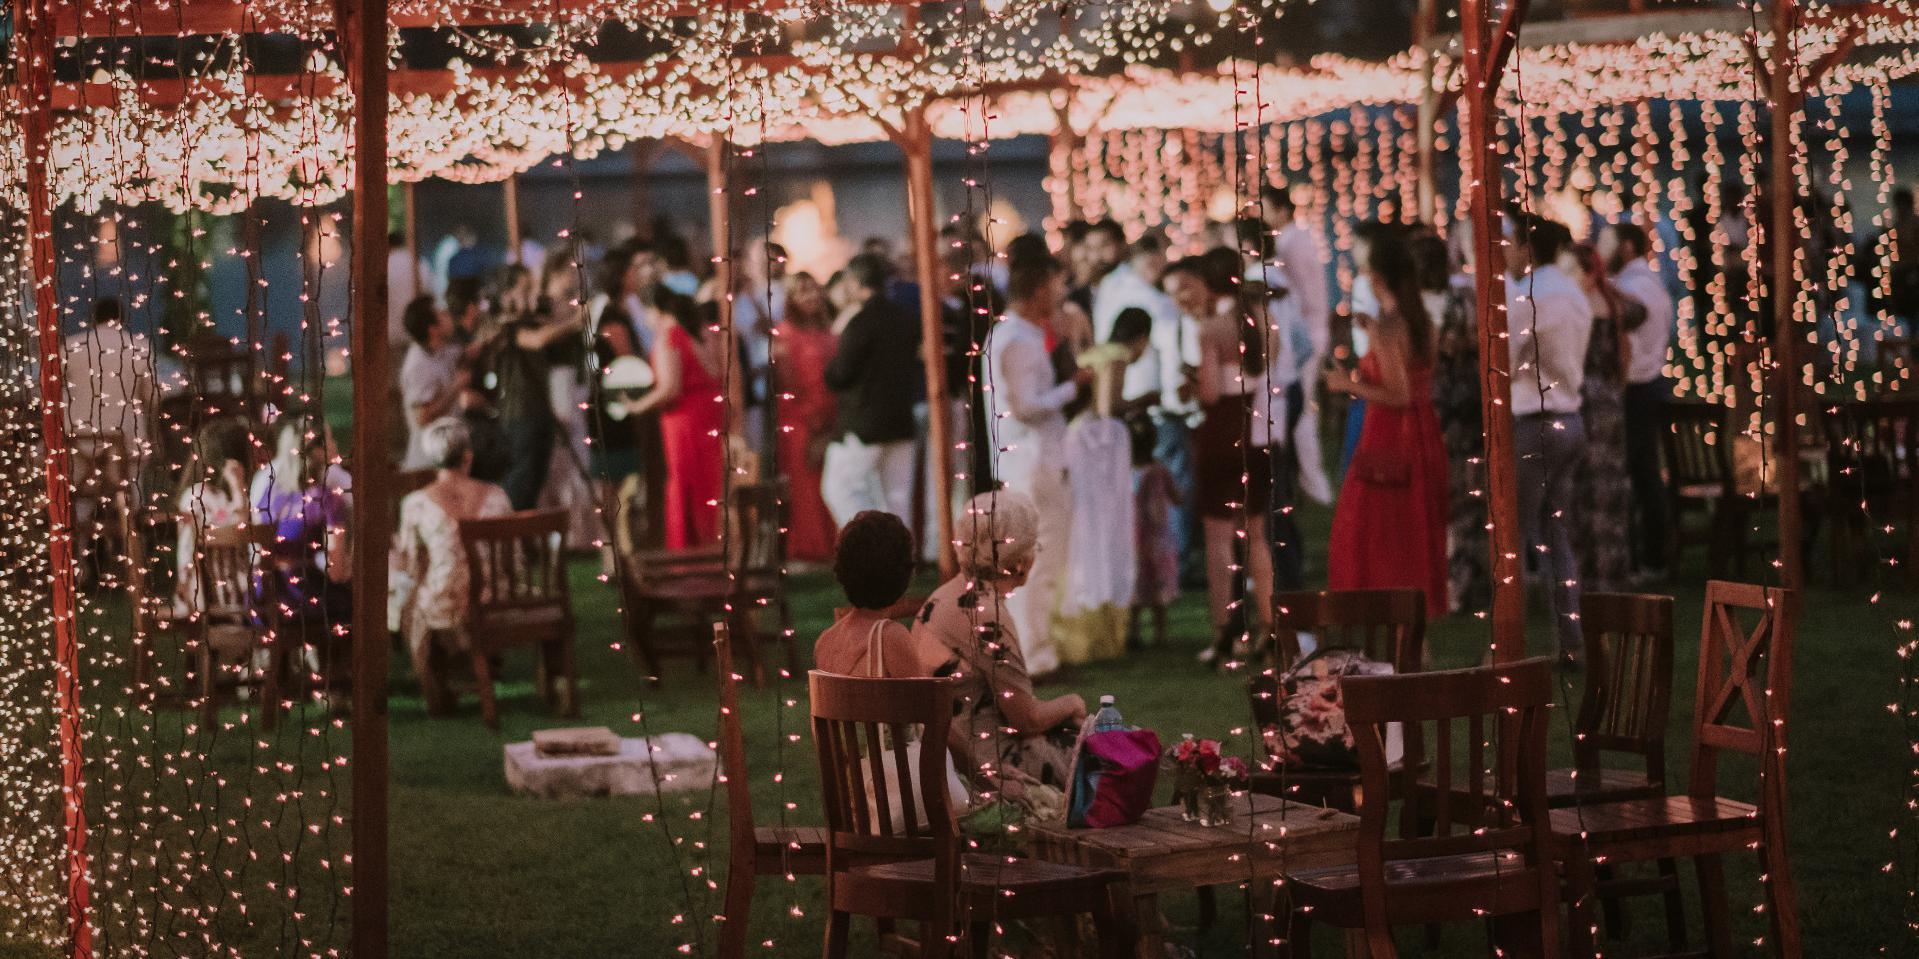 bodas-sin-clasificar-sin-tema-cuba-29421.jpg